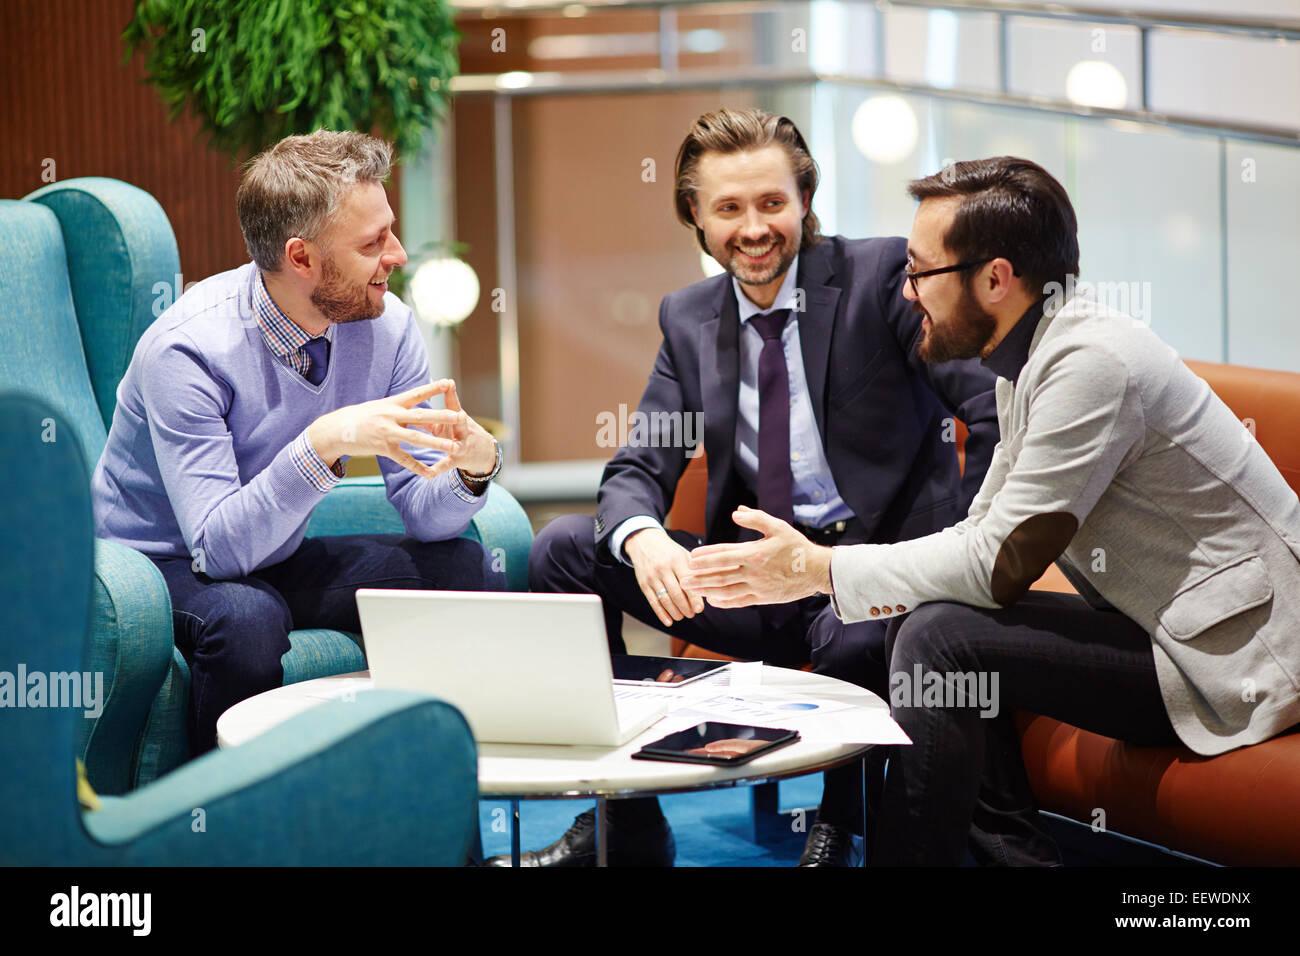 Compañeros de negociación comercial Imagen De Stock